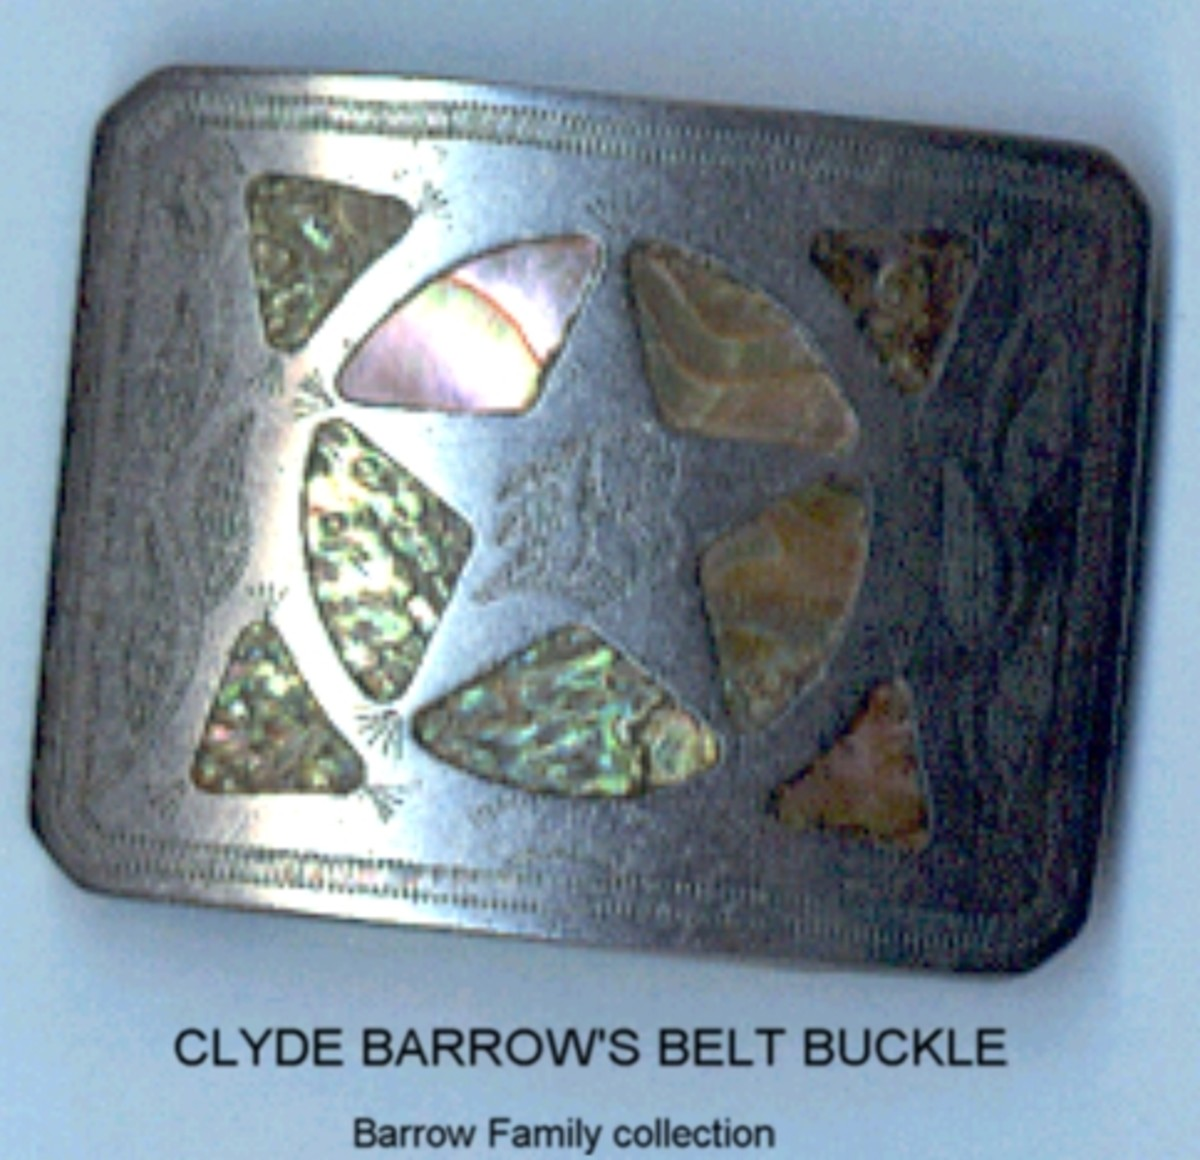 Clyde Barrow's Belt Buckle